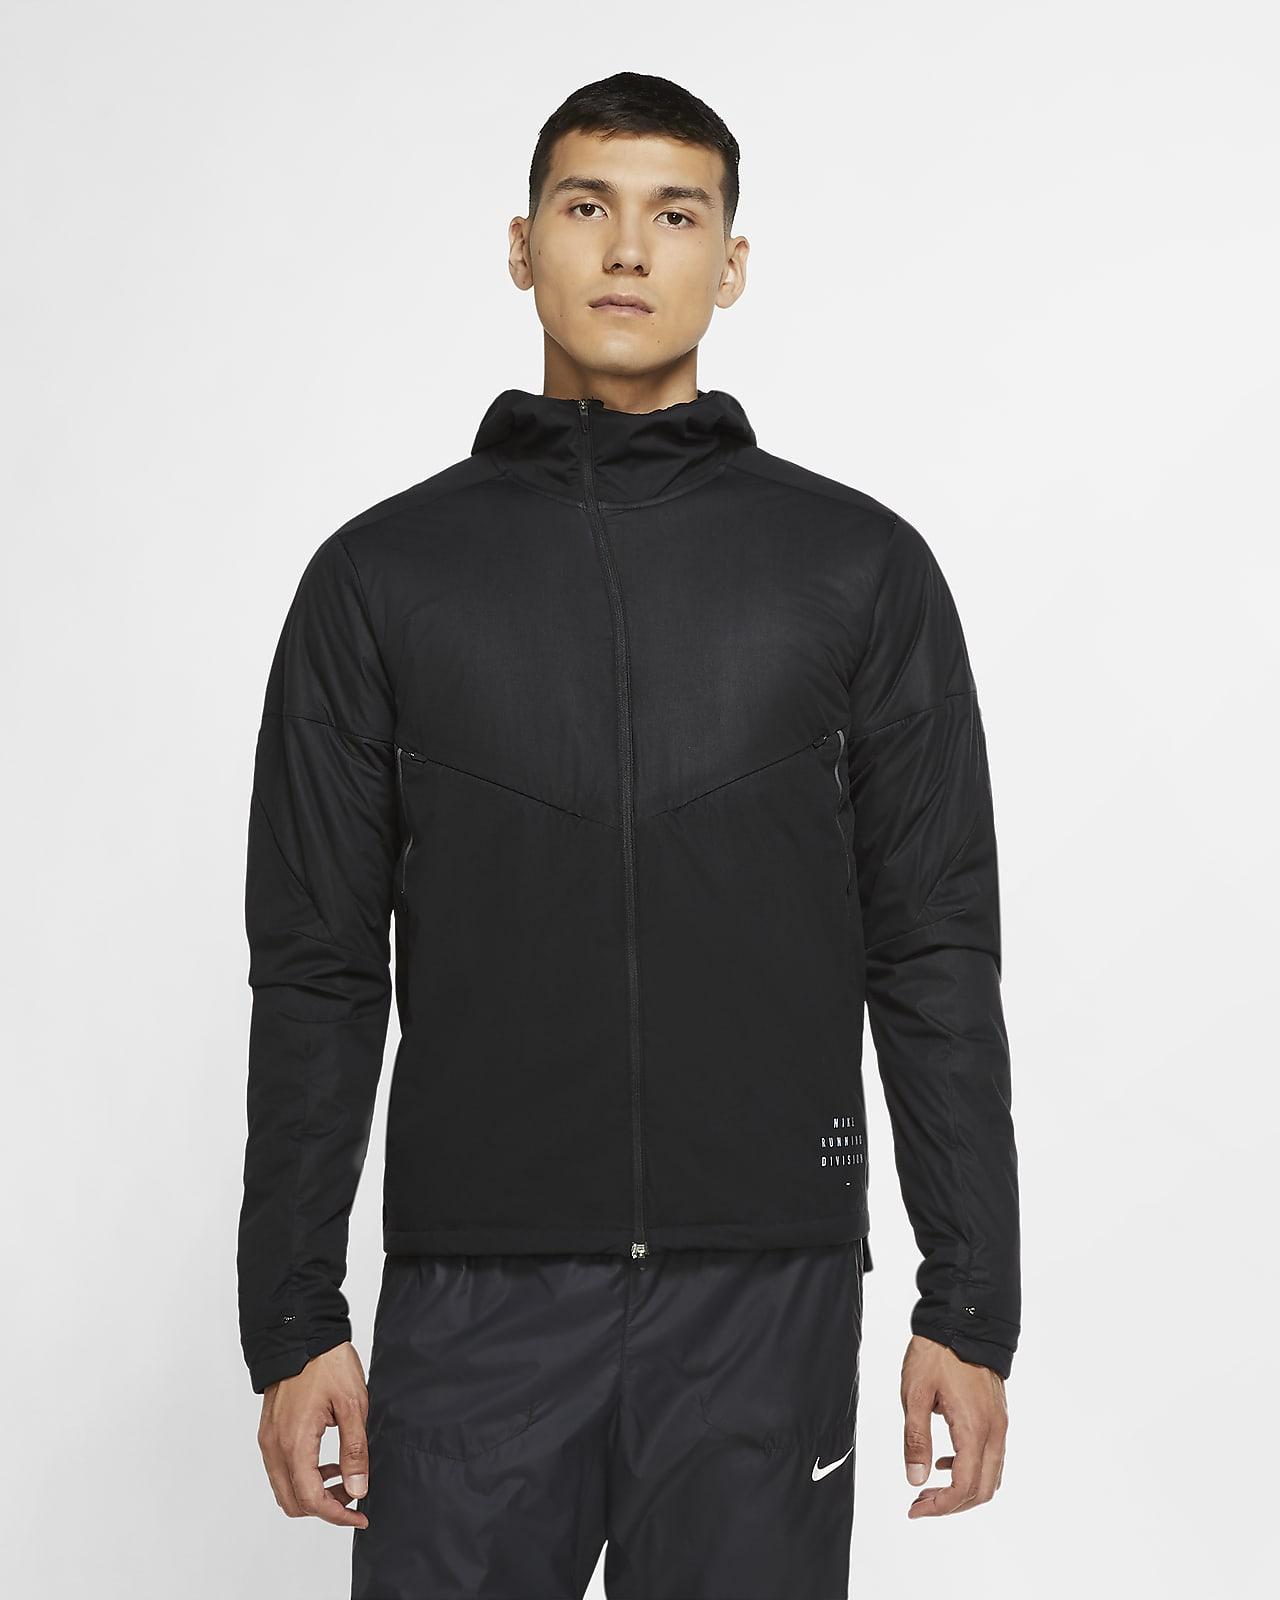 Nike Run Division Men's Dynamic Vent Running Jacket